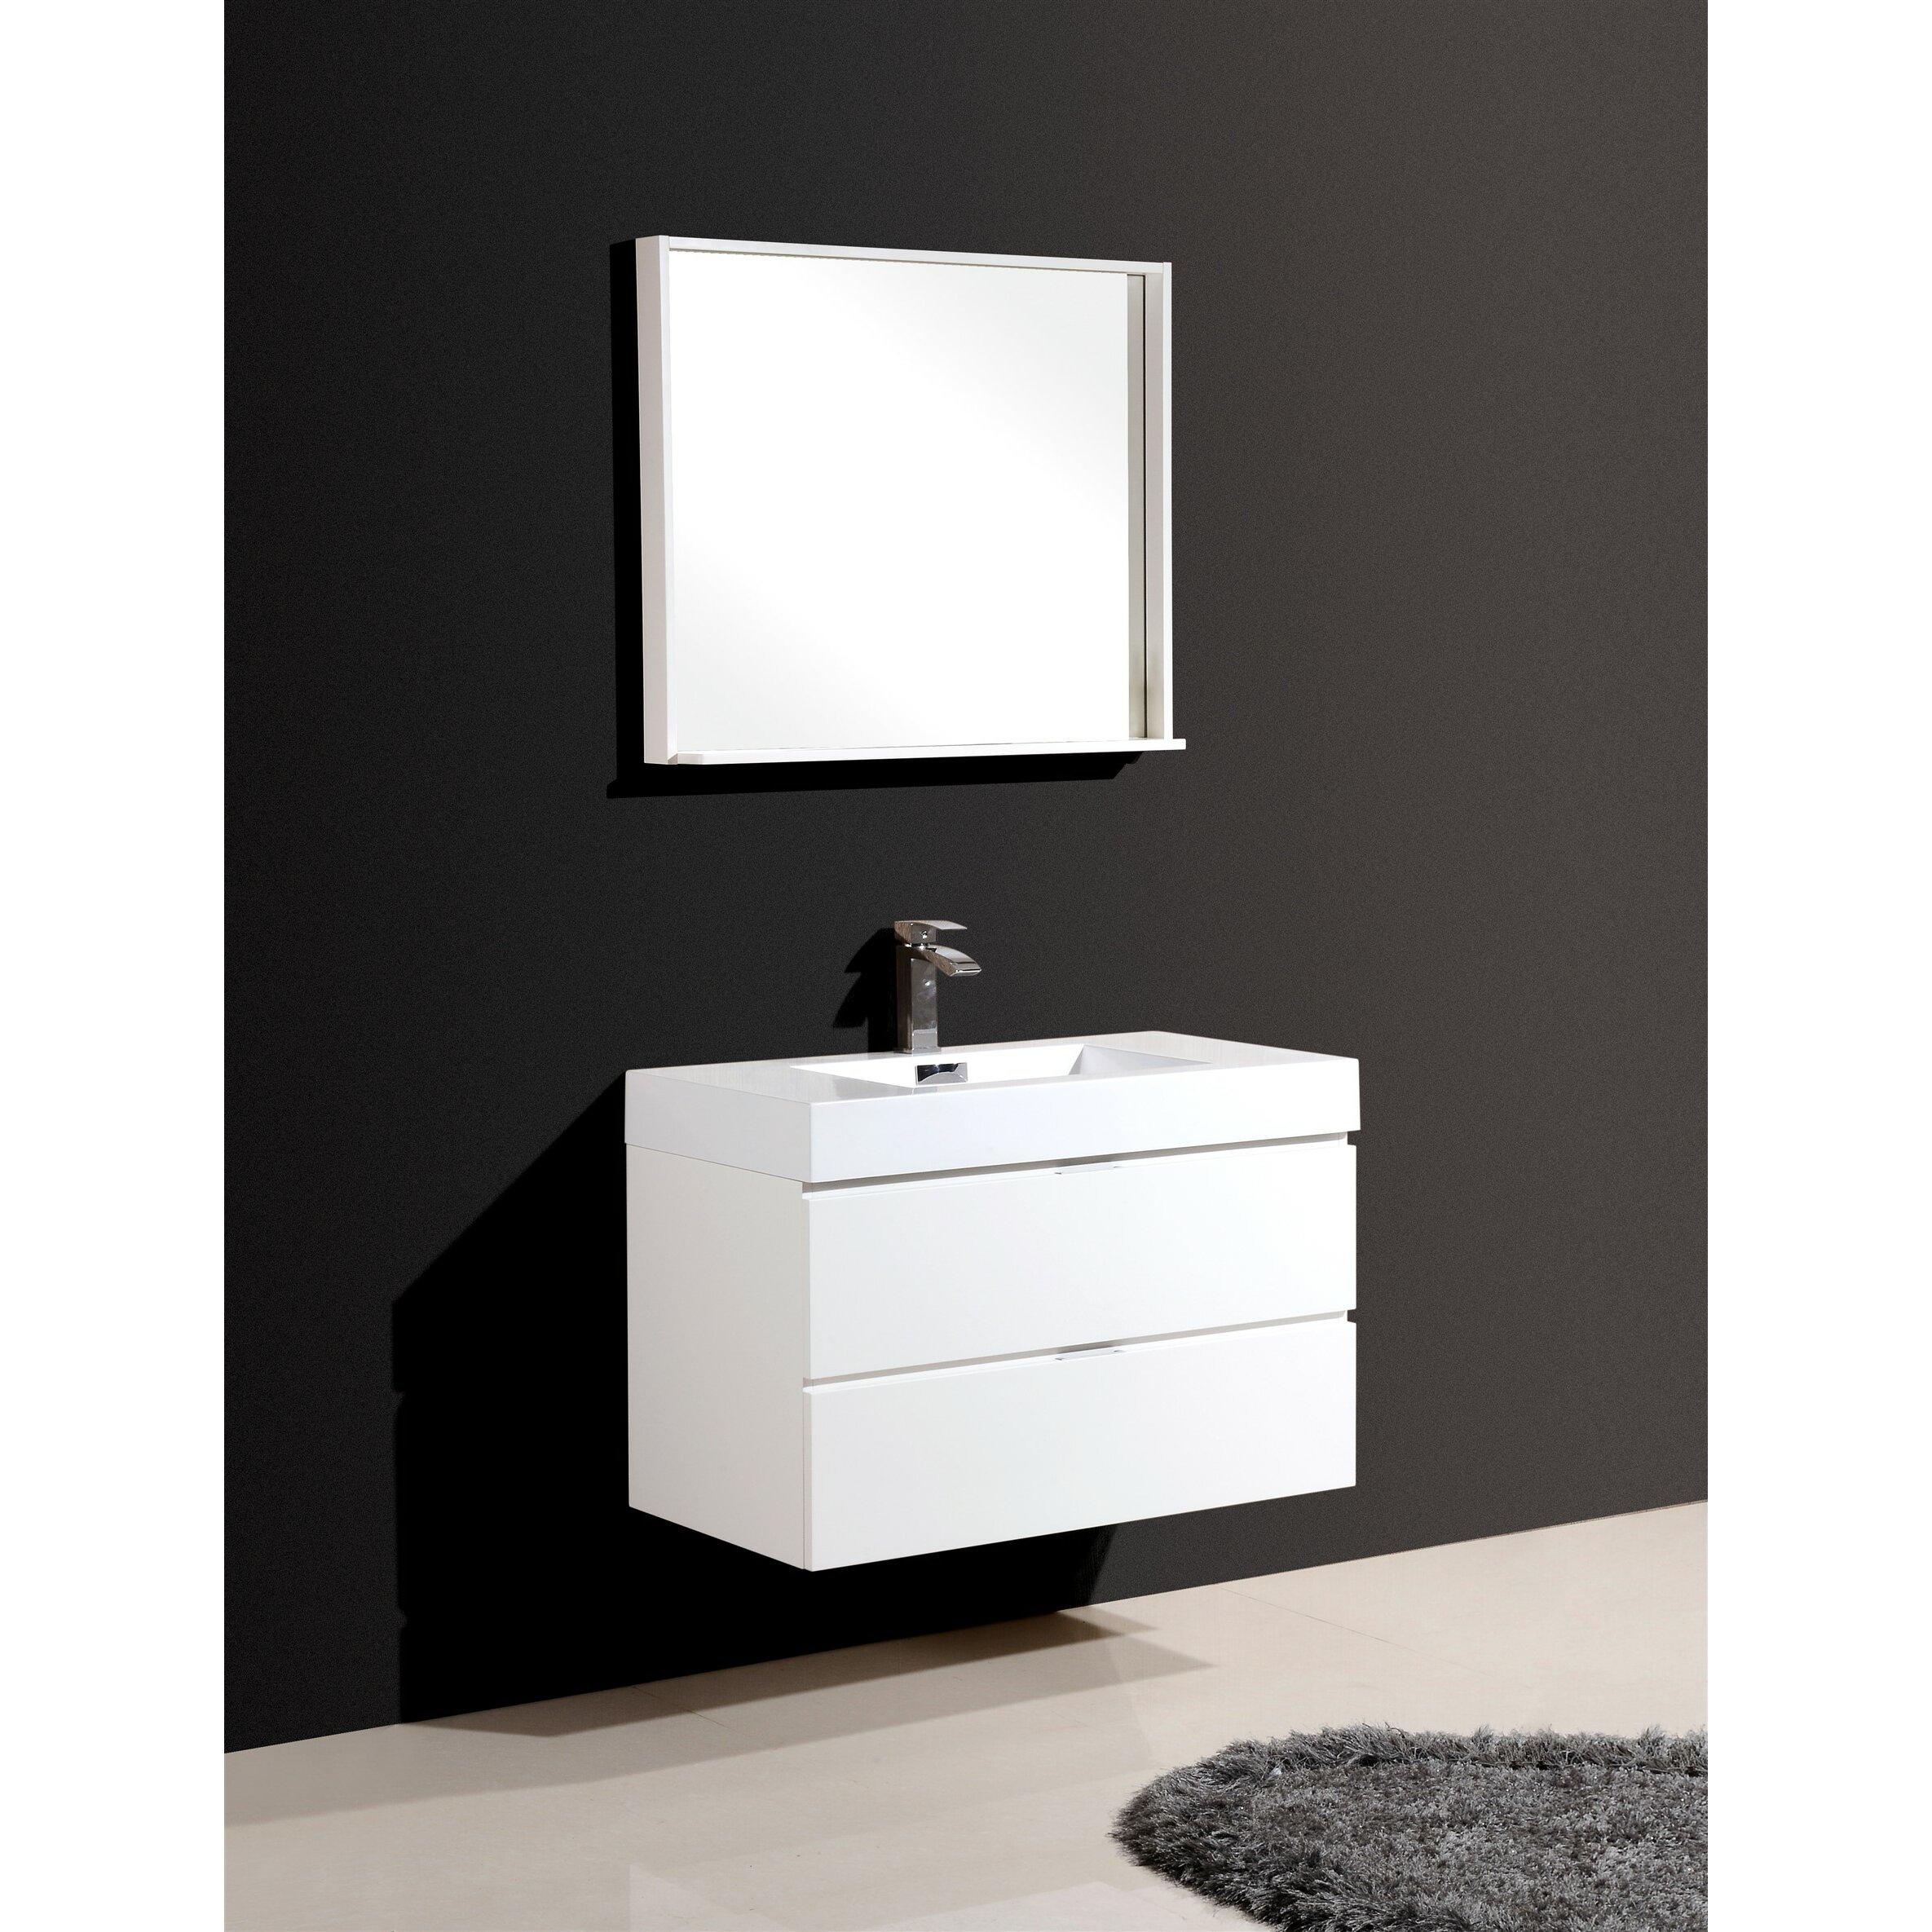 Kube bath bliss 36 single wall mount modern bathroom for Modern bathroom sets